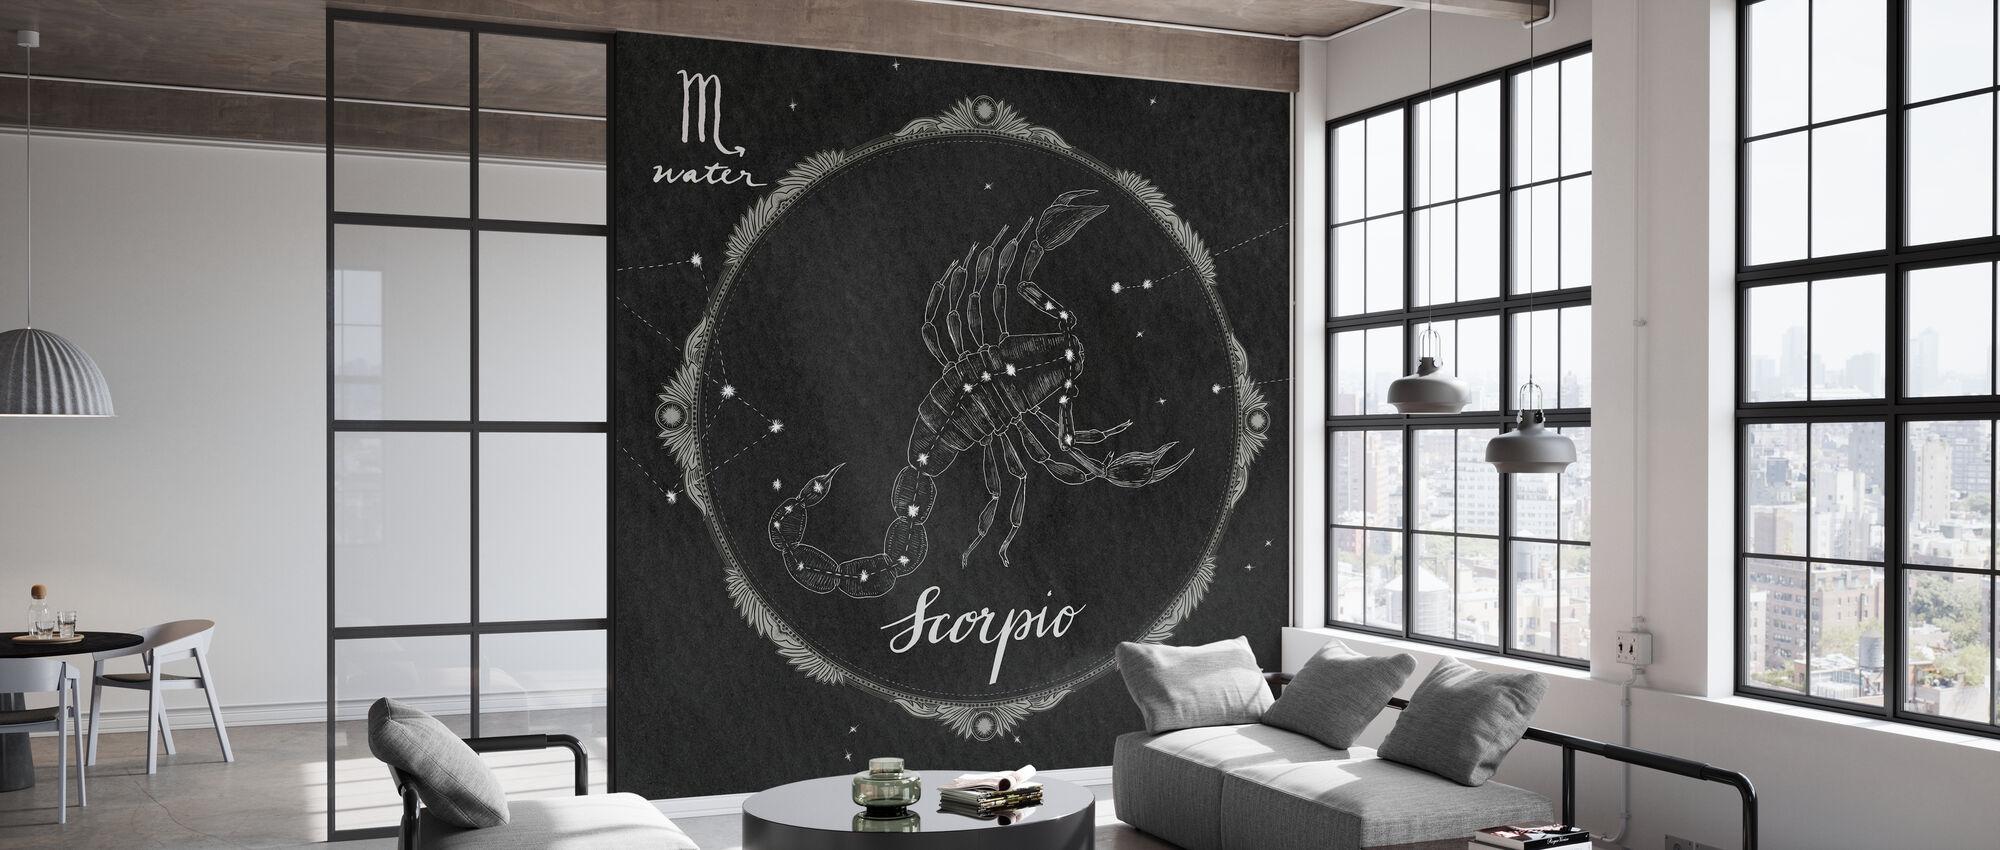 Night Sky Scorpio - Wallpaper - Office